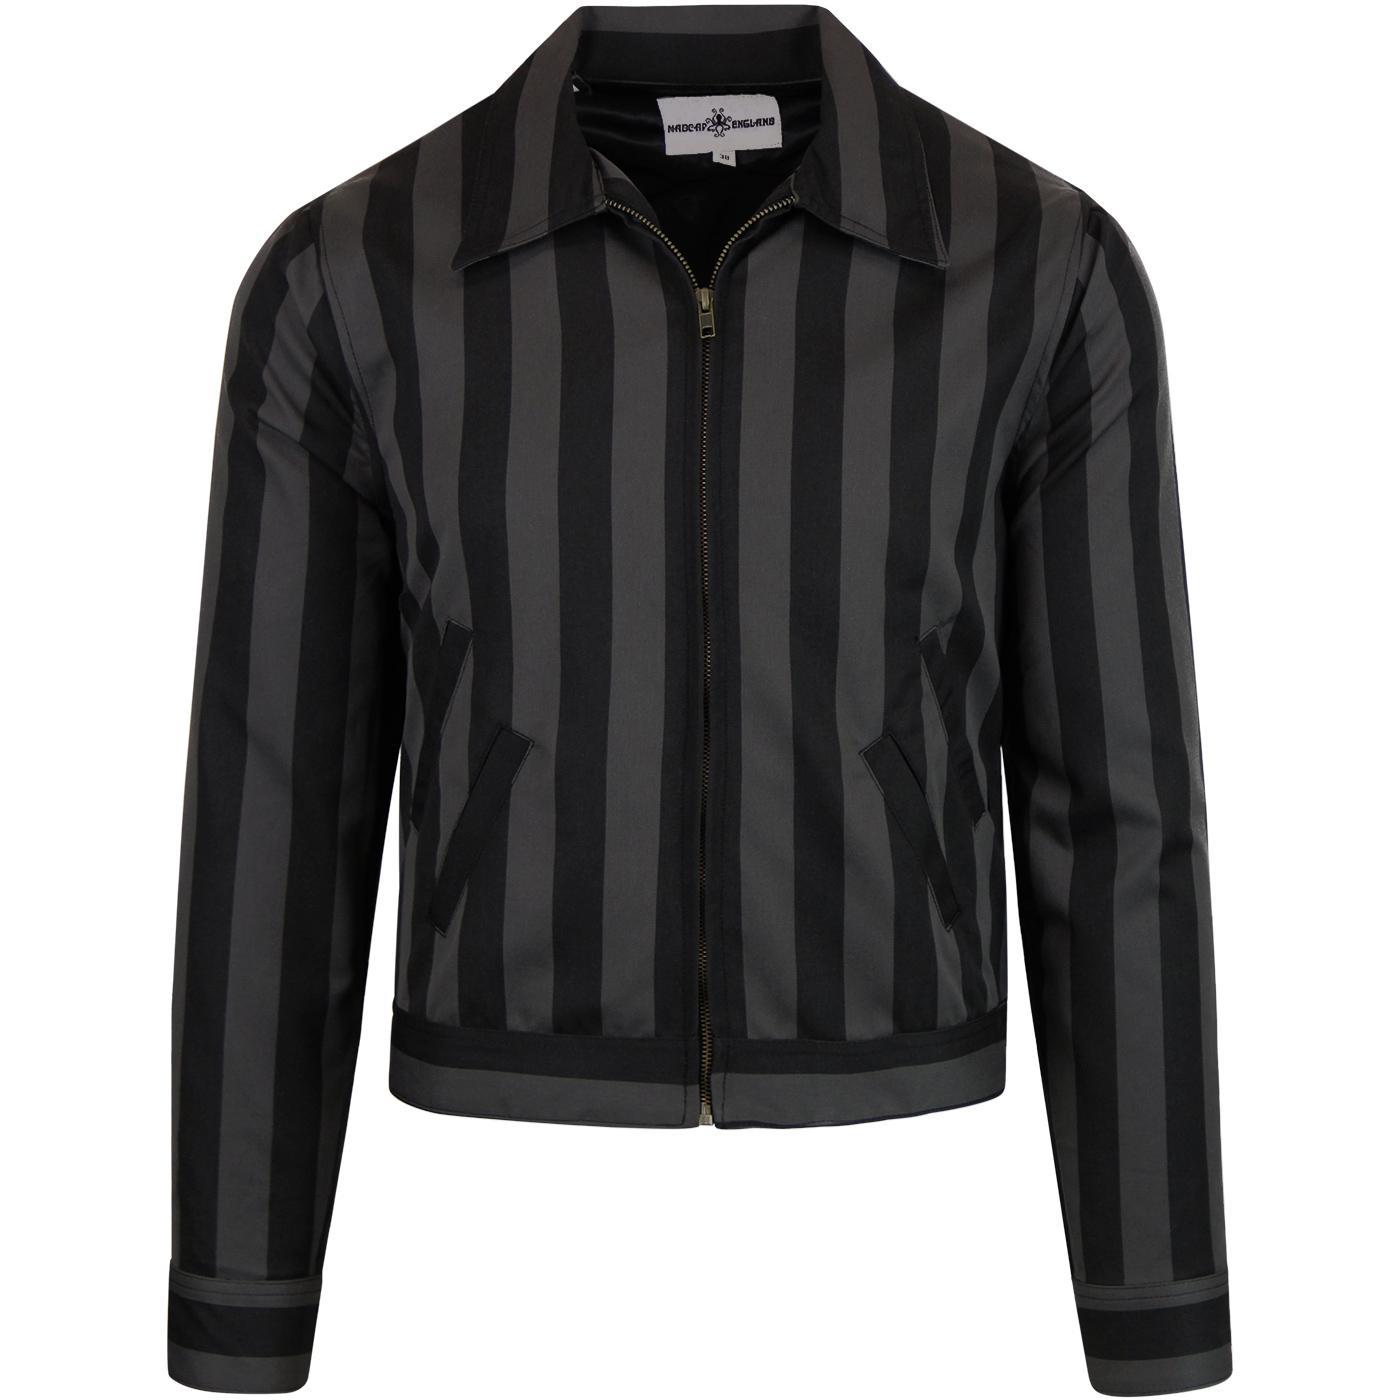 Jailbird MADCAP ENGLAND Mod Stripe Collared Jacket